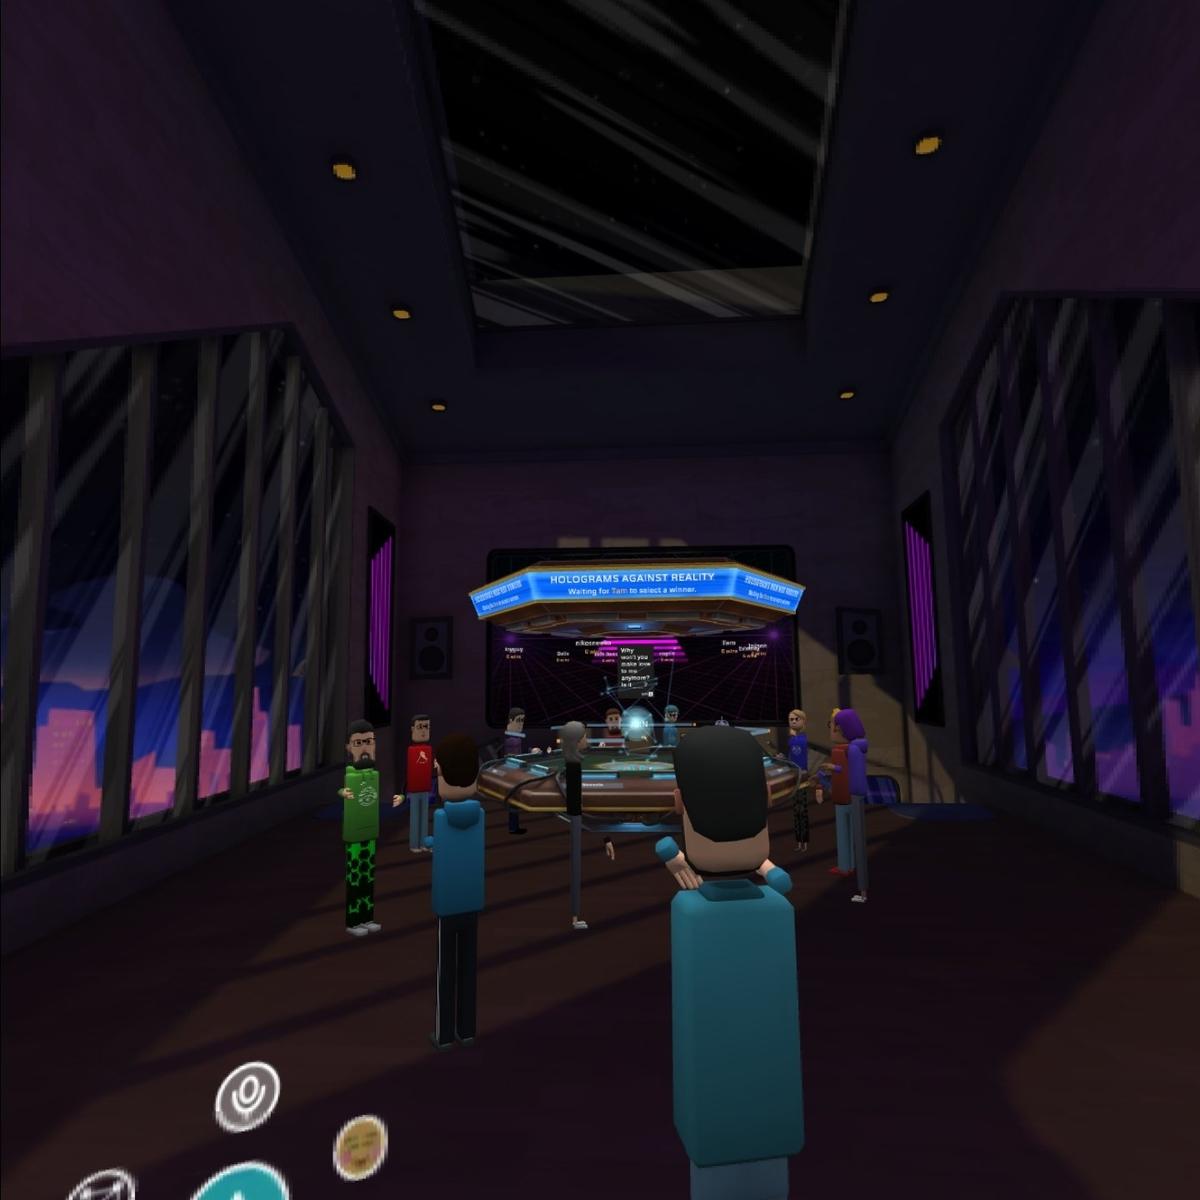 Oculus Questのアプリ「AltspaceVR」の様子